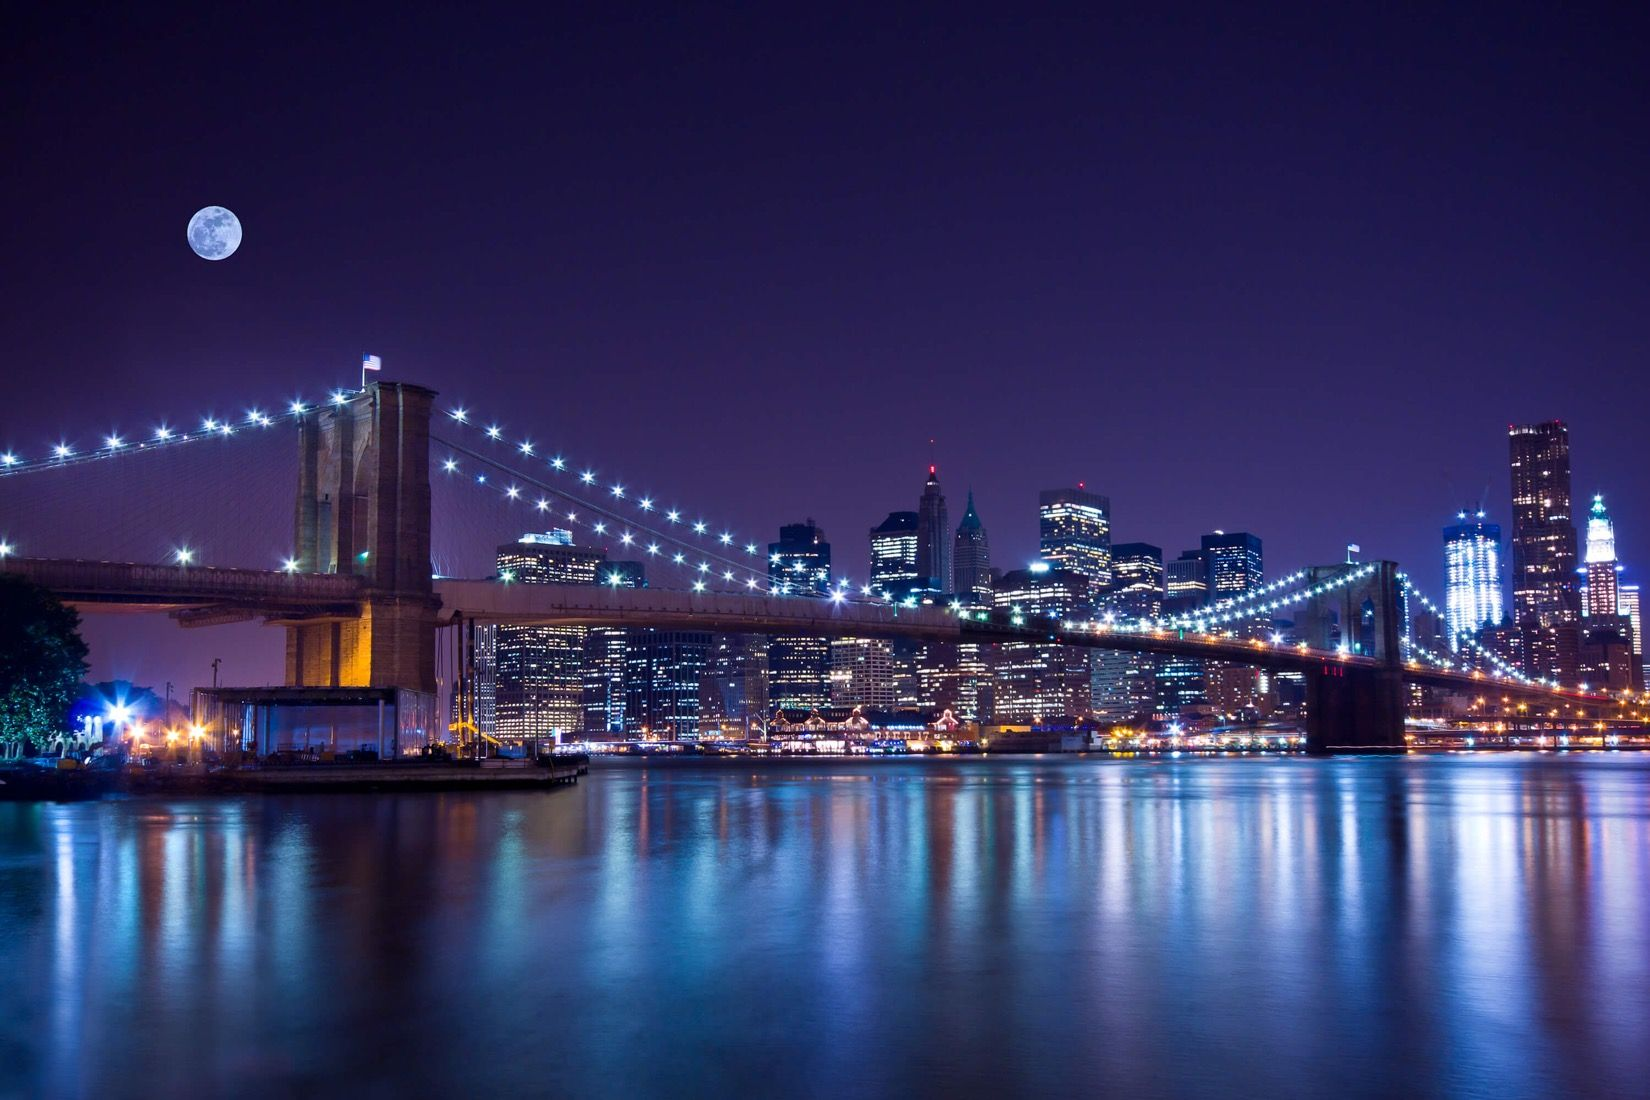 Brooklyn Bridge Wallpaper Murals Wallpaper Bridge Wallpaper Brooklyn Bridge Urban Landscape